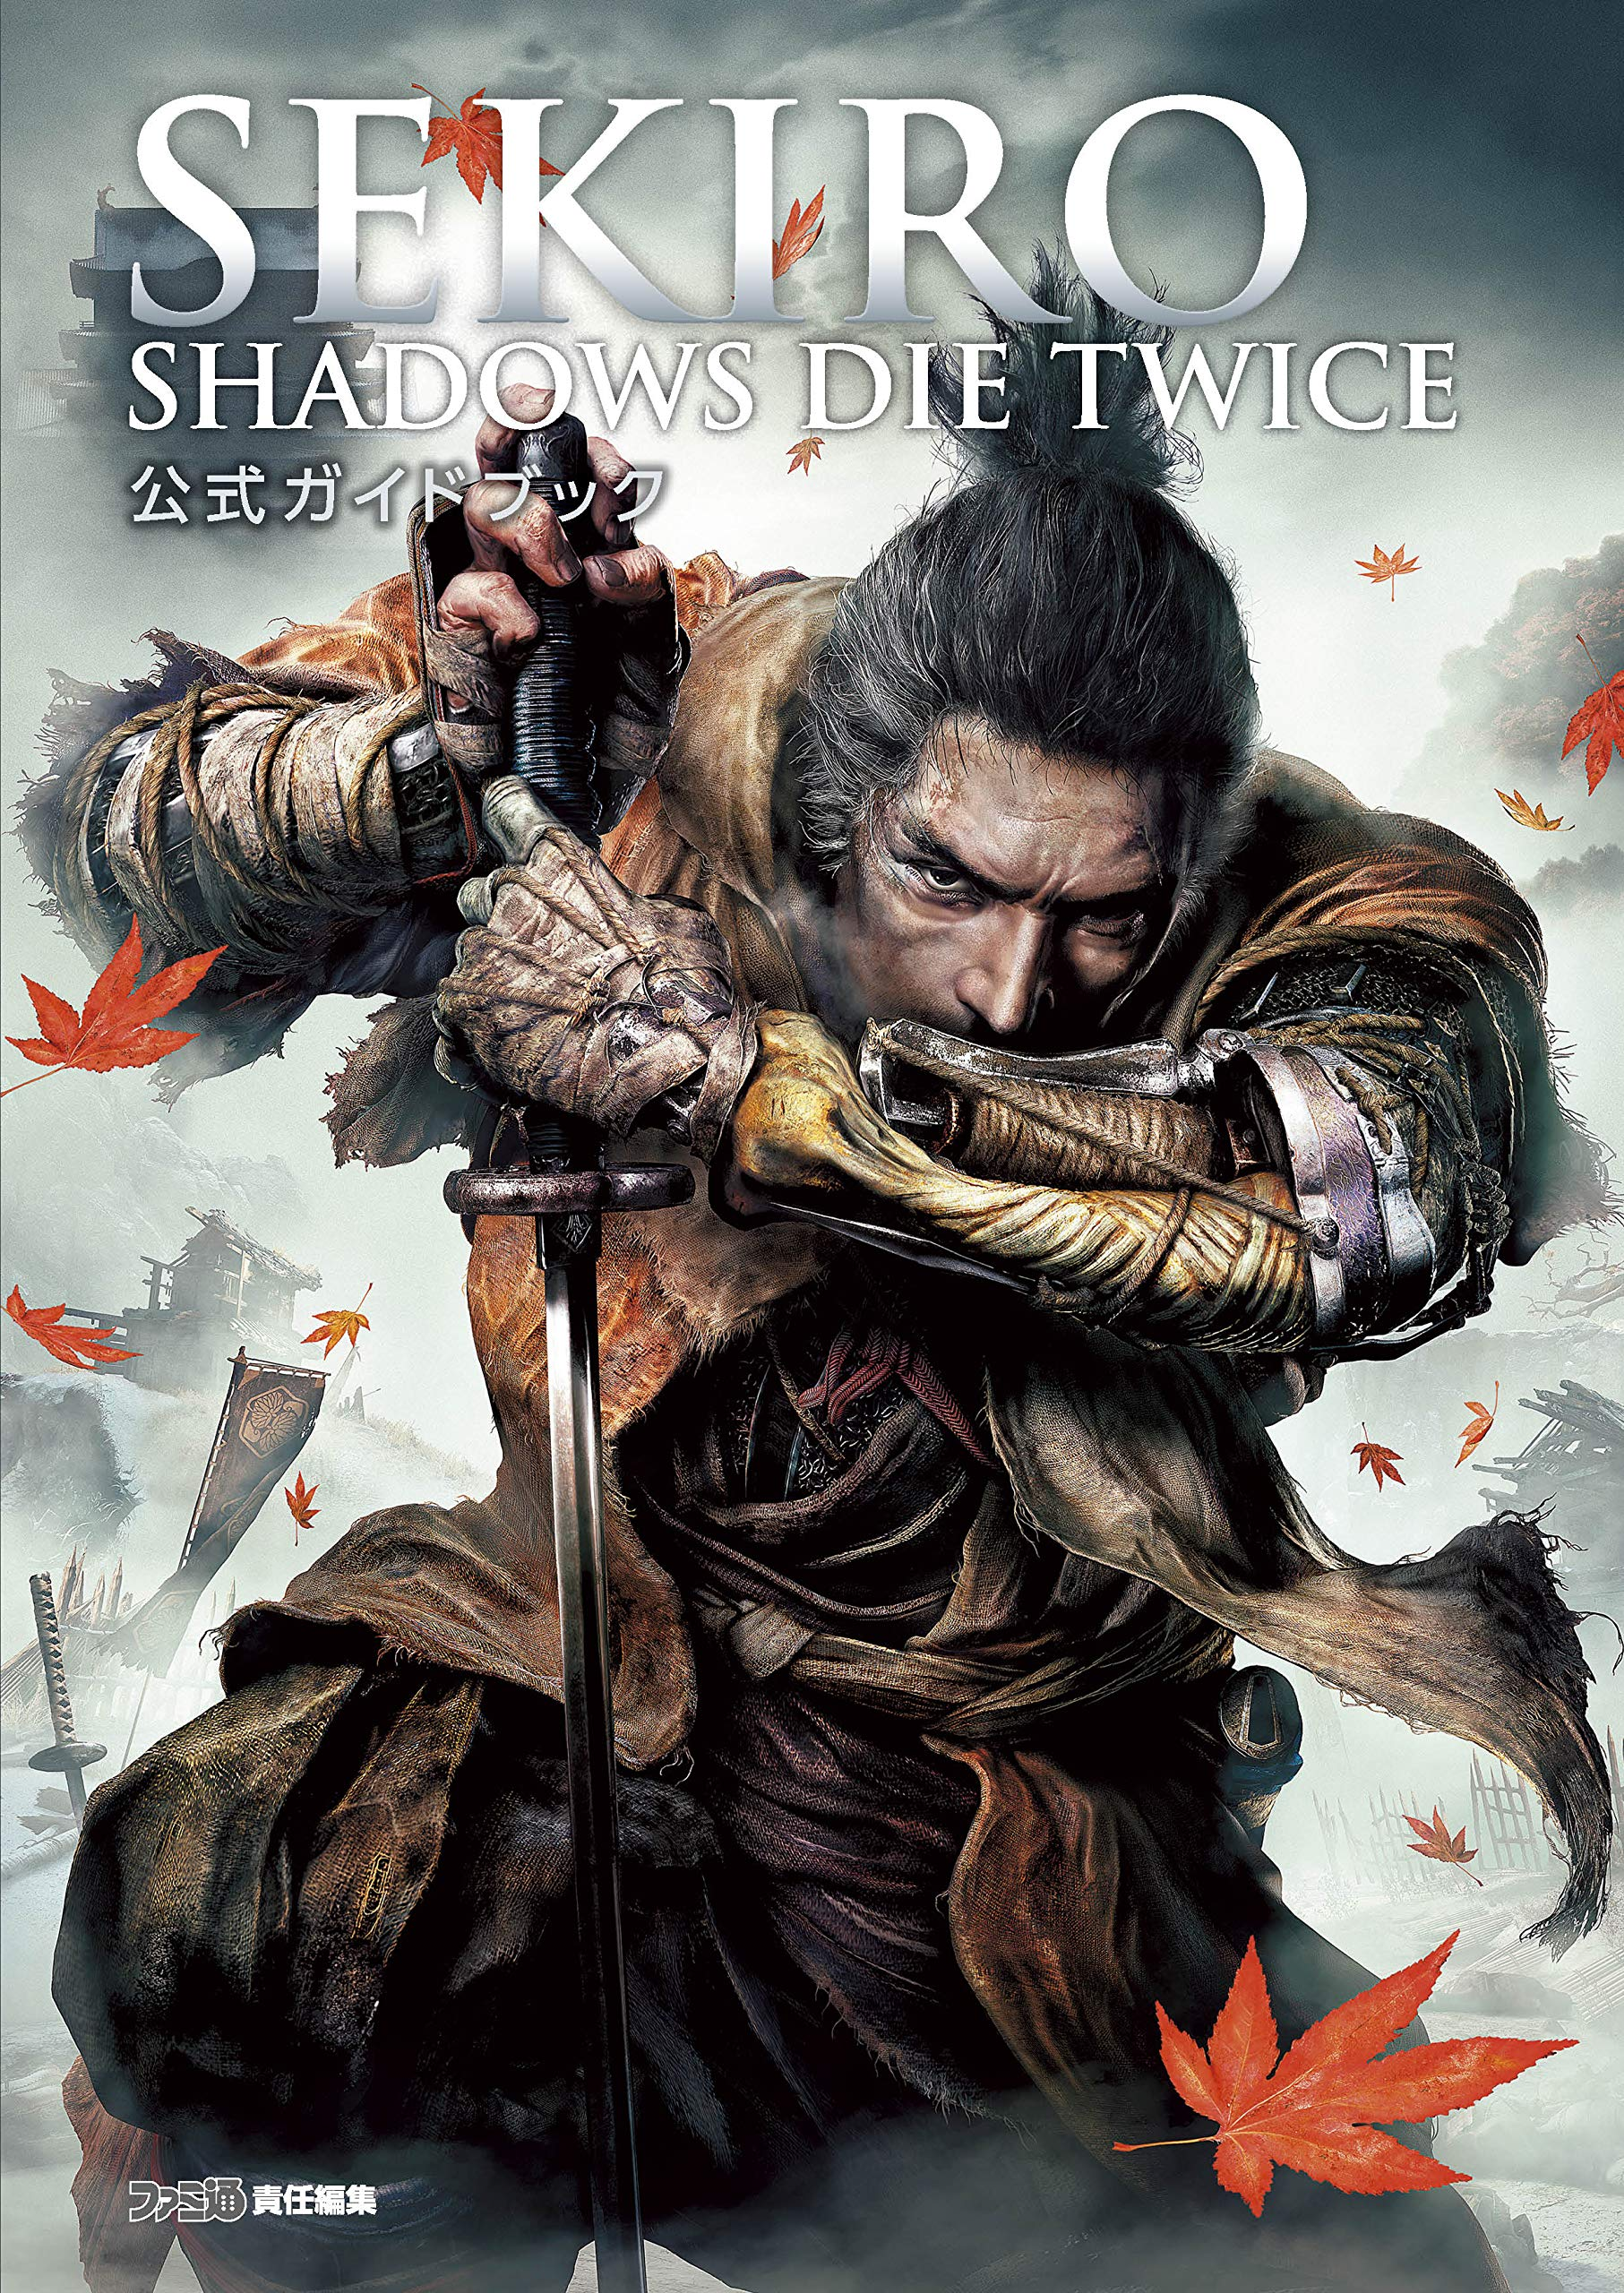 Sekiro: Shadows Die Twice-GOTY Edition | RePack By Xatab